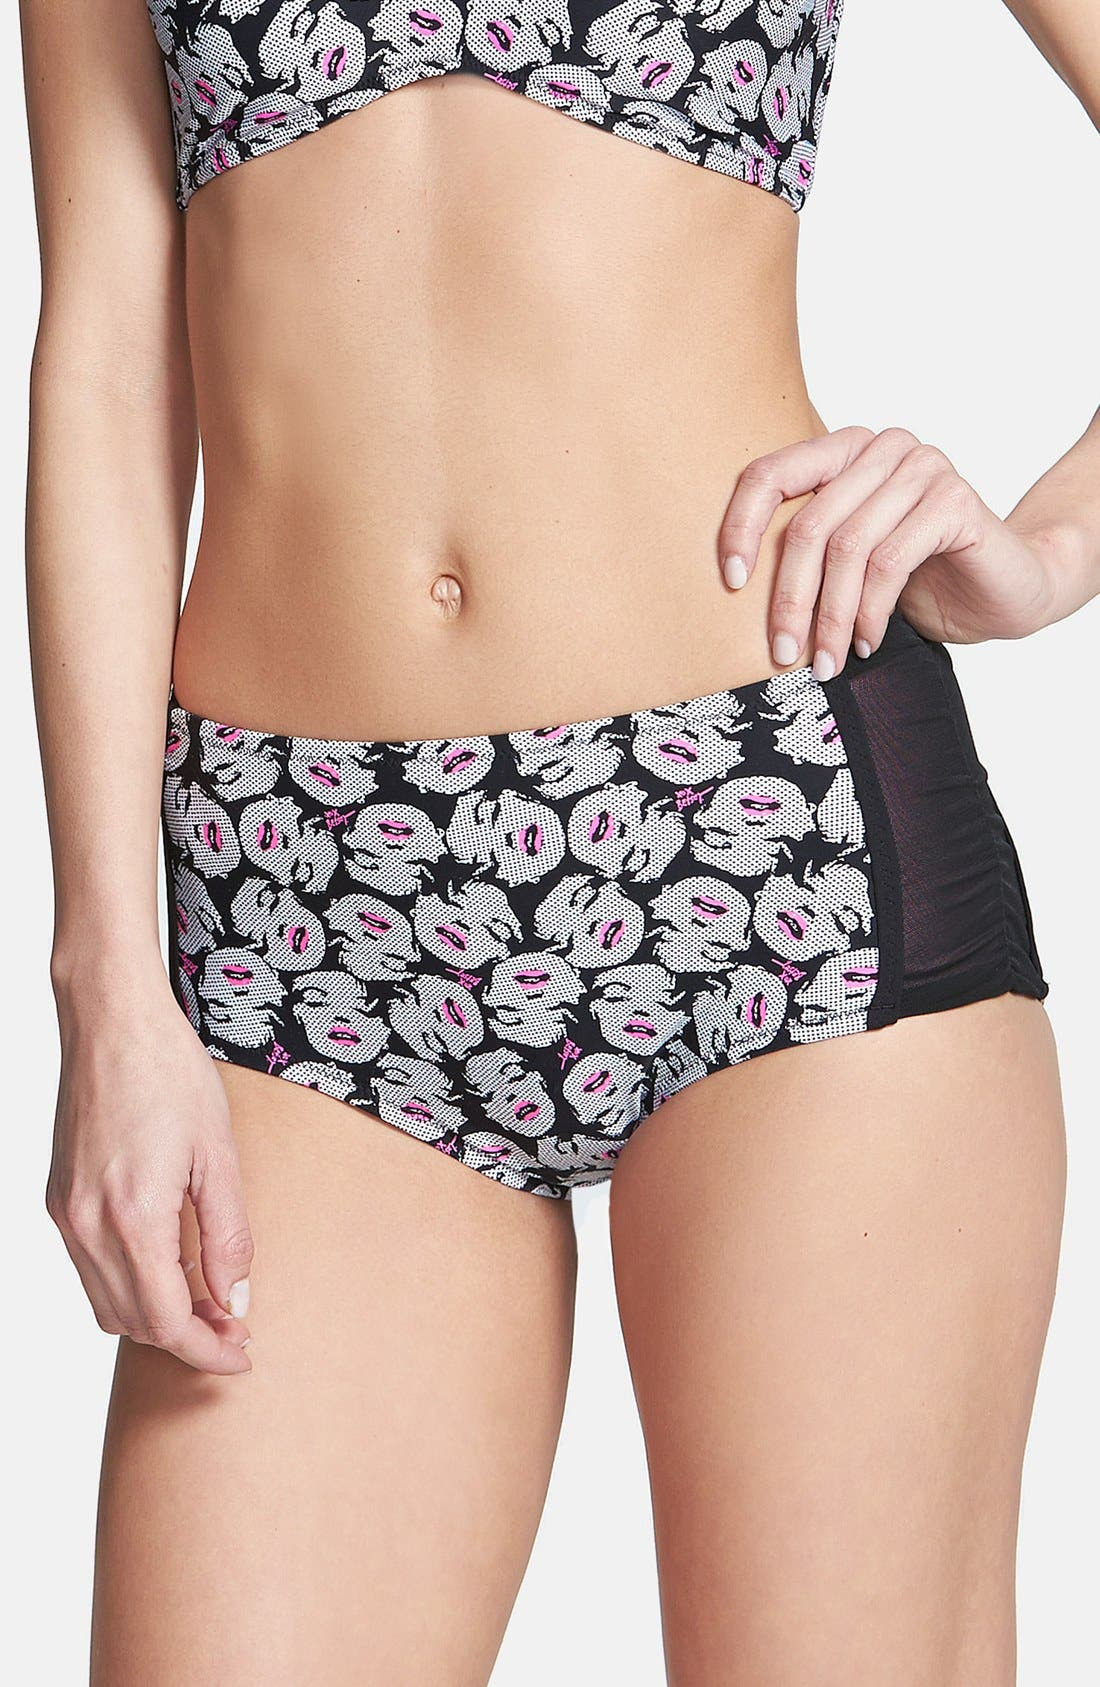 Main Image - Betsey Johnson 'Betsey Meets Friend' High Waist Bikini Bottoms